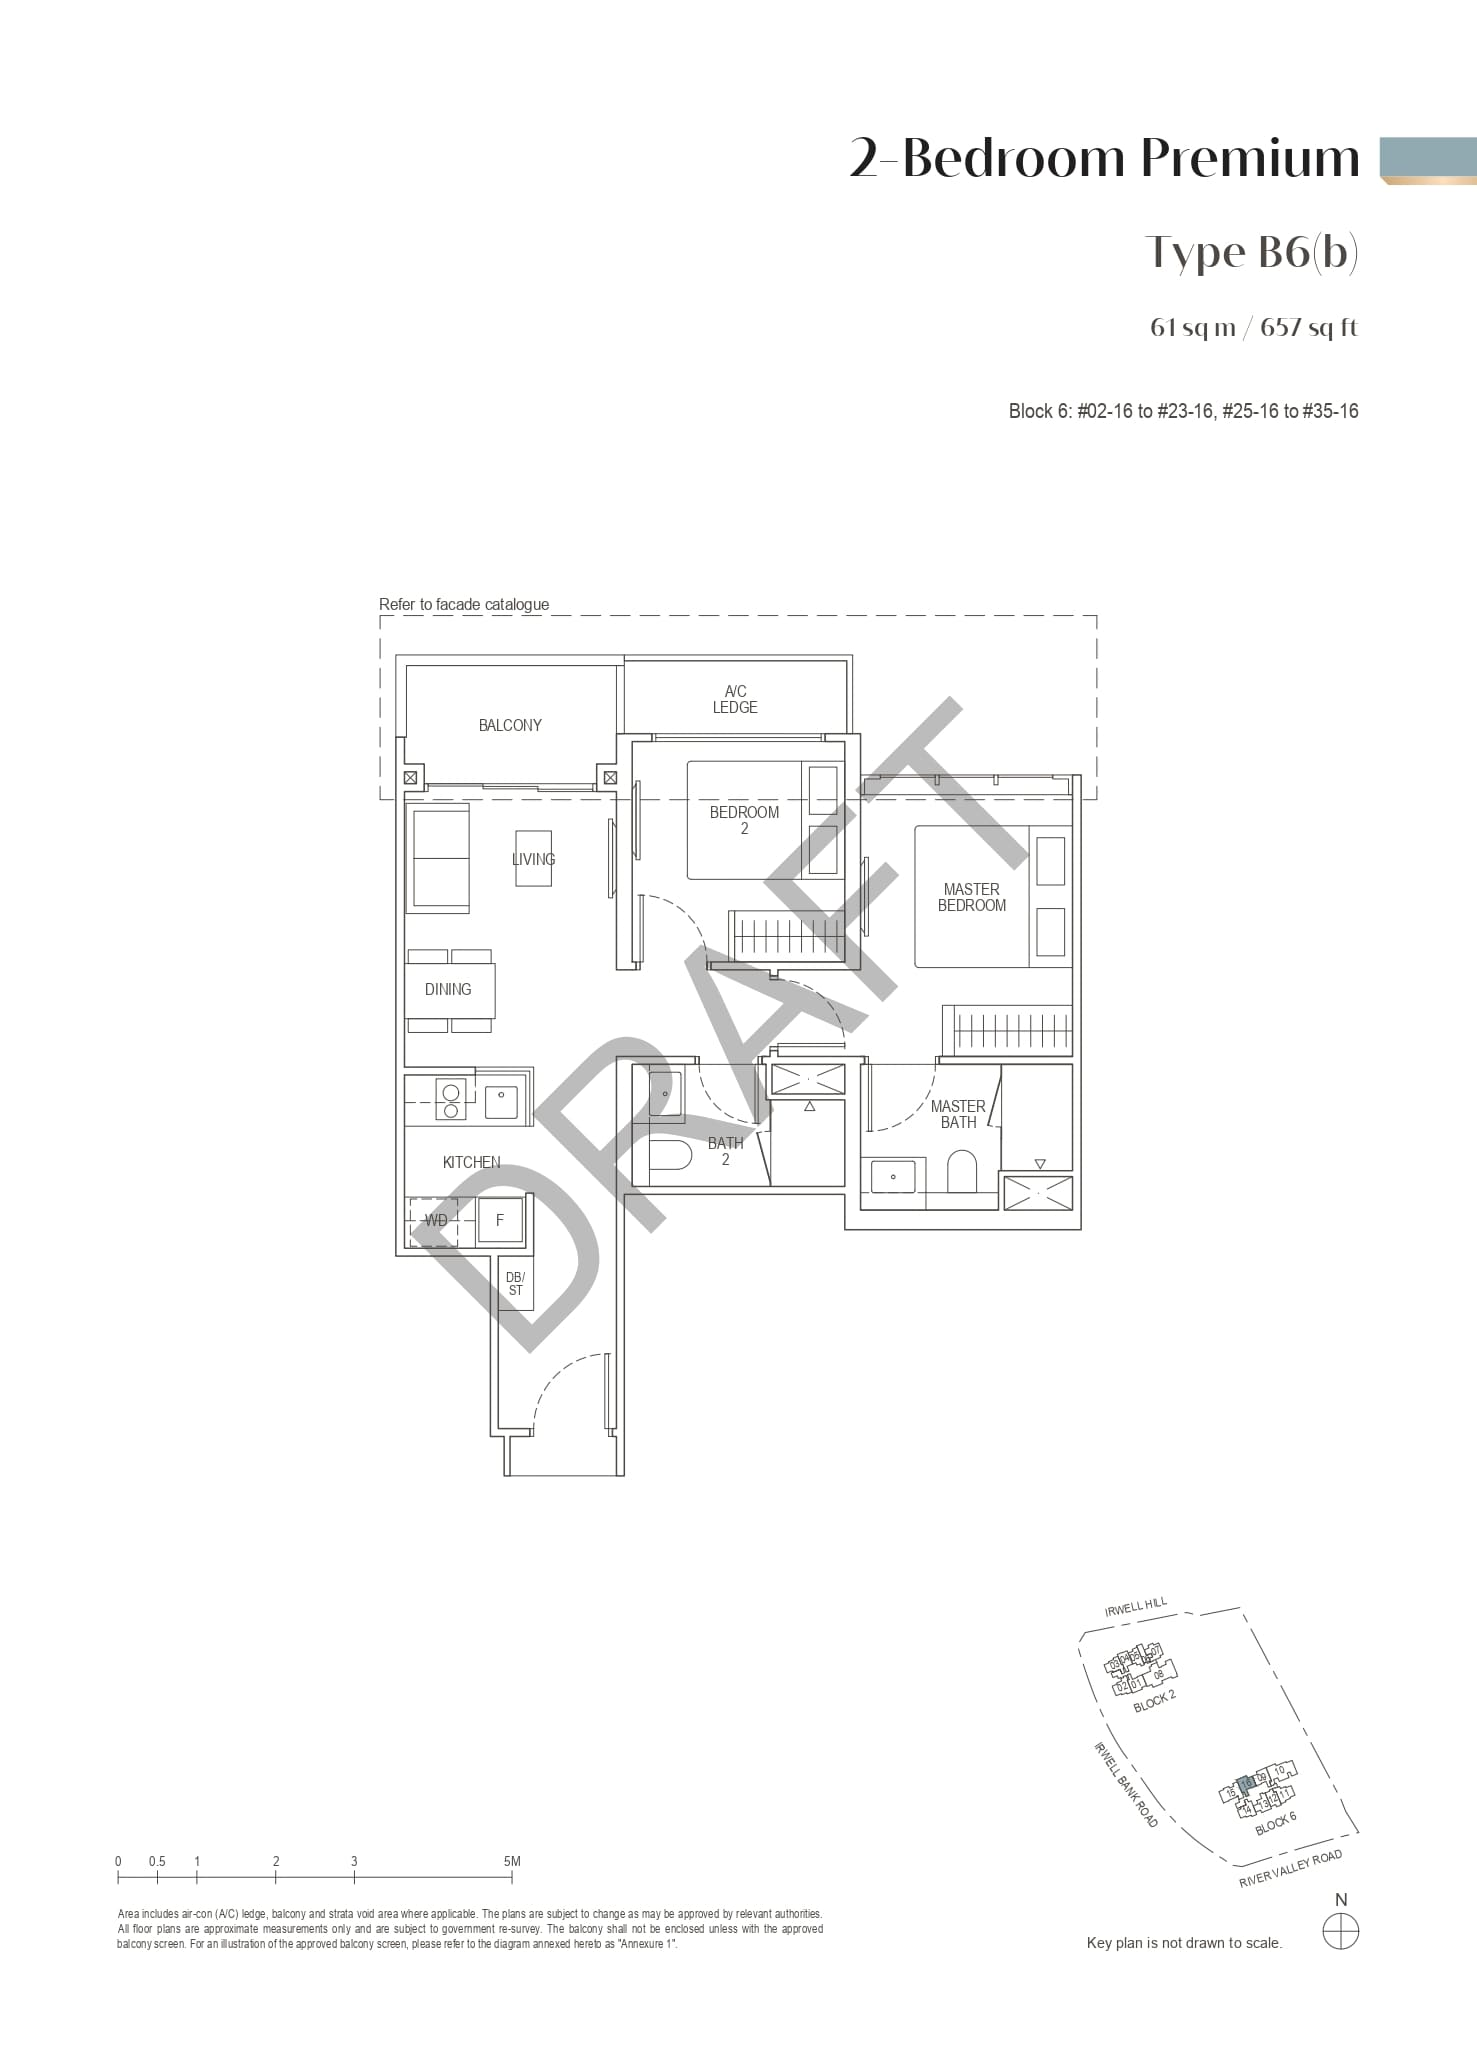 irwell-hill-residences-floor-plan-2-bedroom-premium-type-b6b